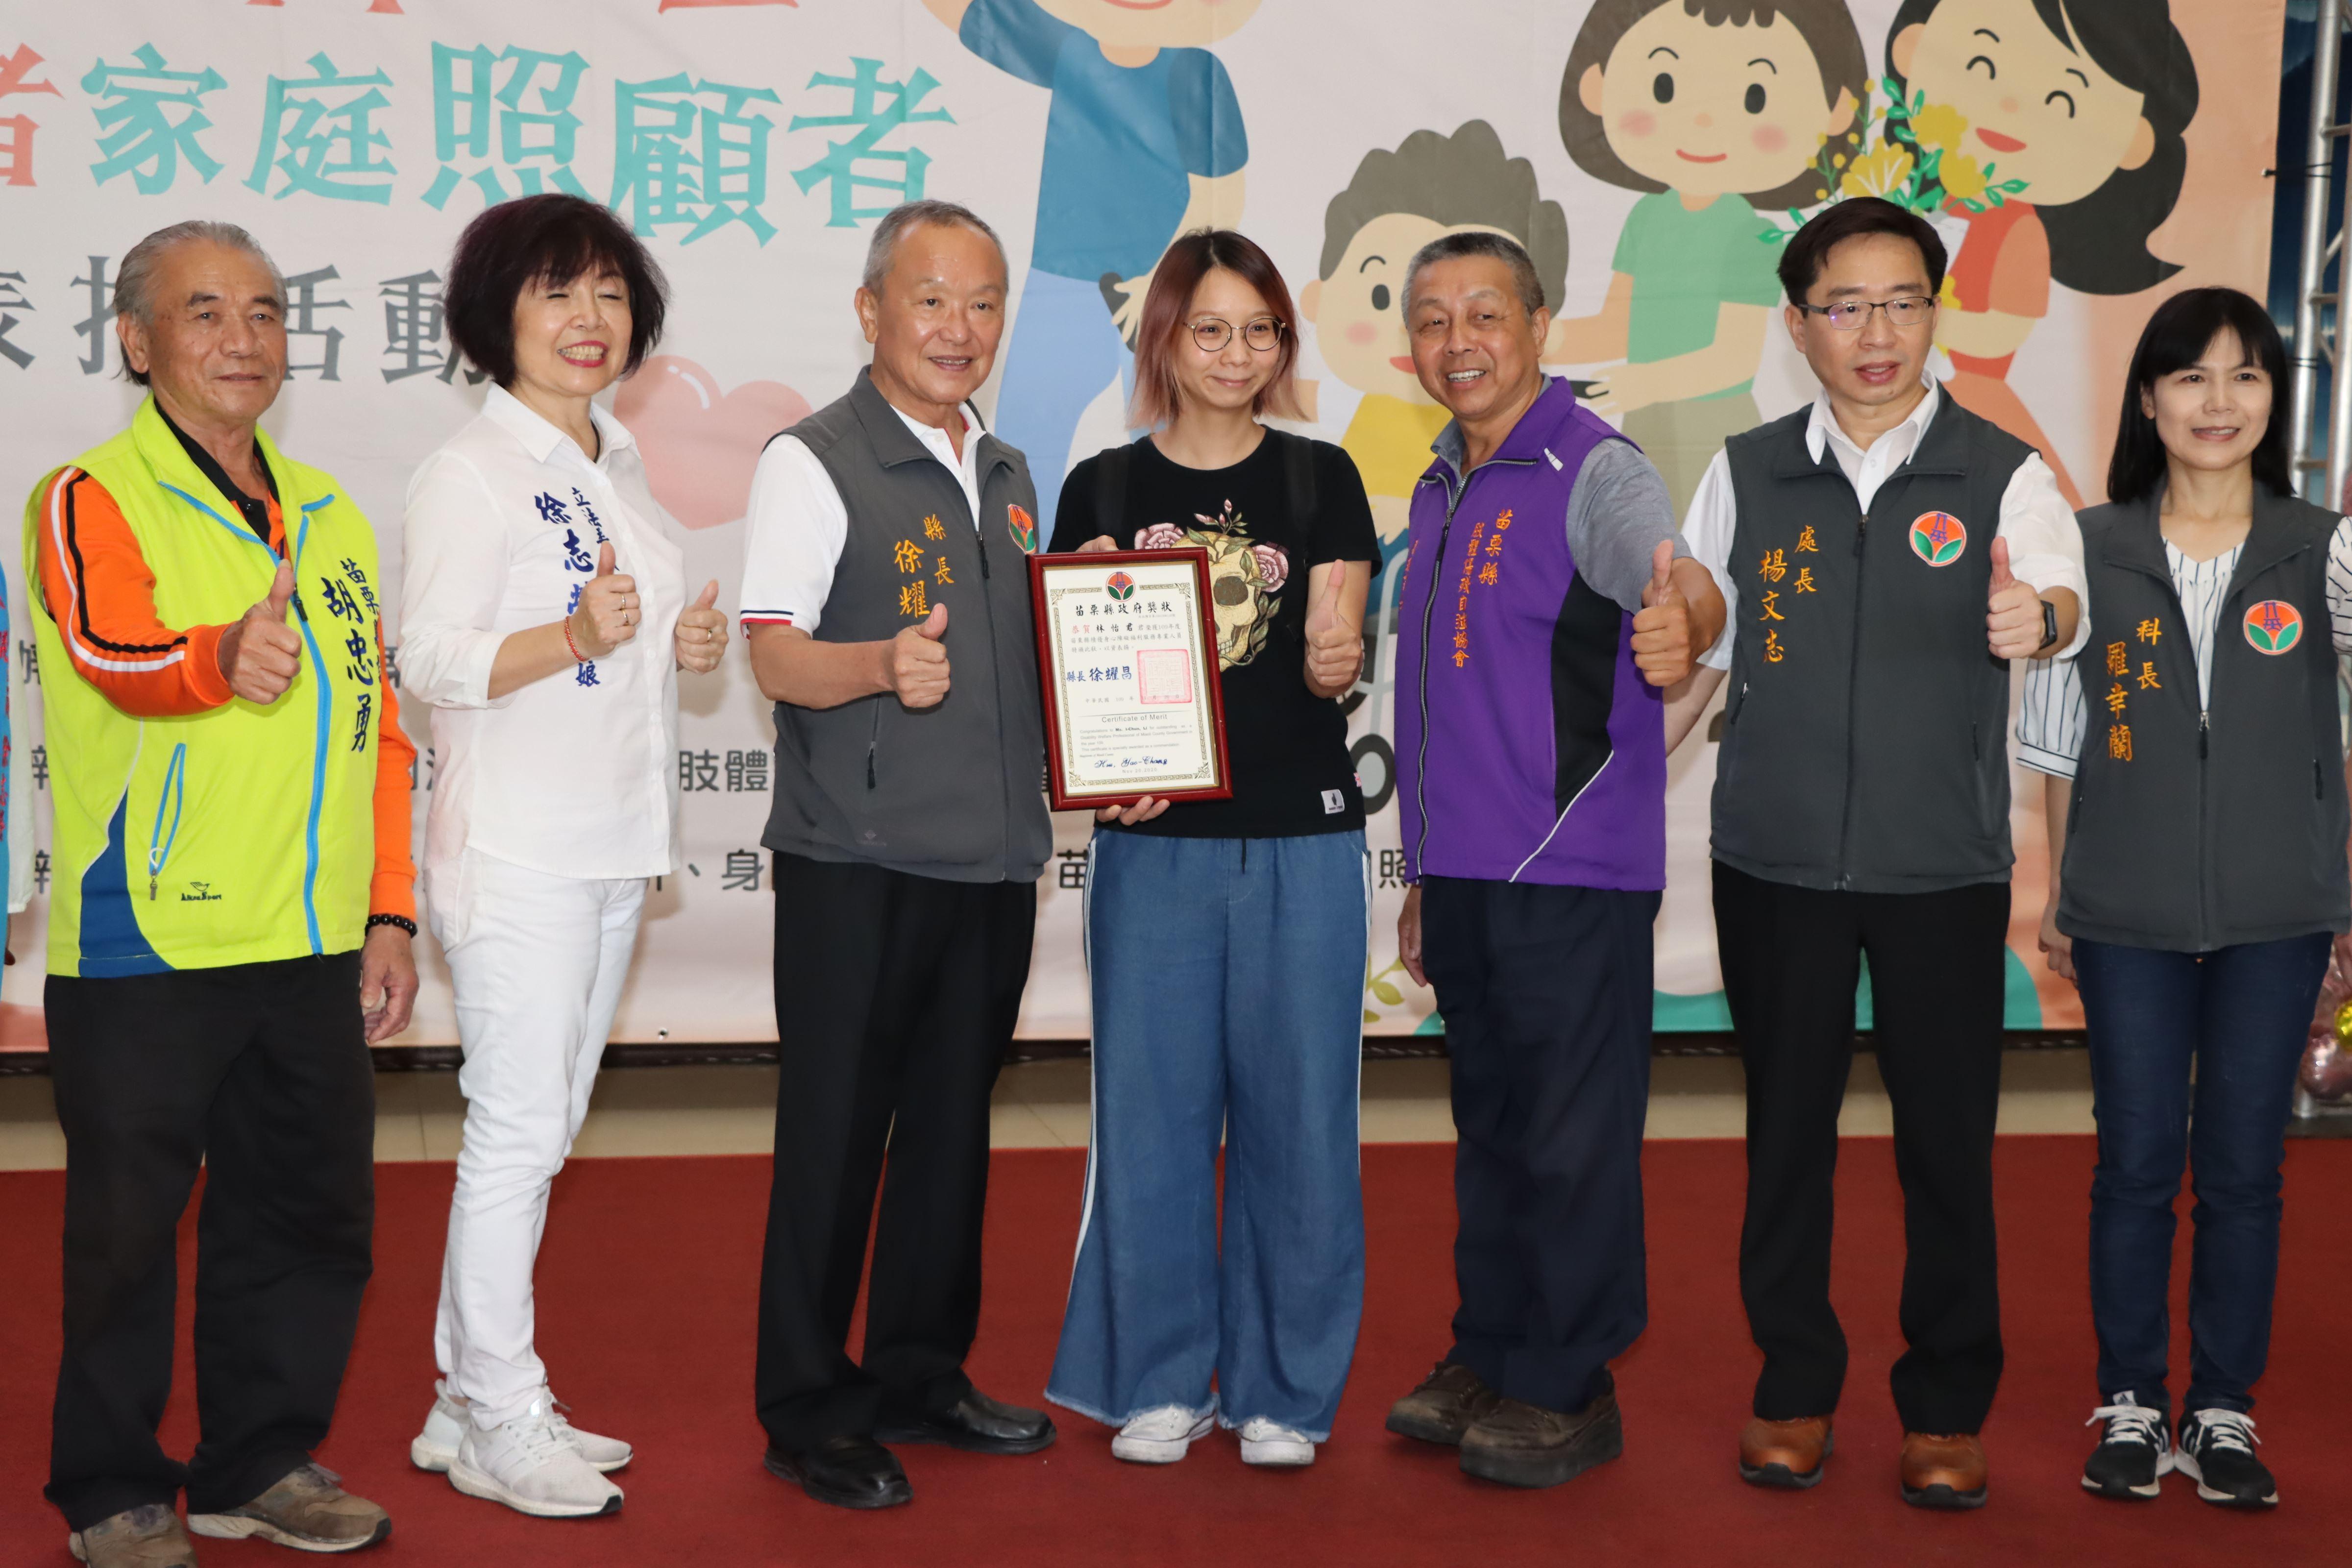 6A縣府-表揚績優身障福利服務專業人員IMG_0973.JPG